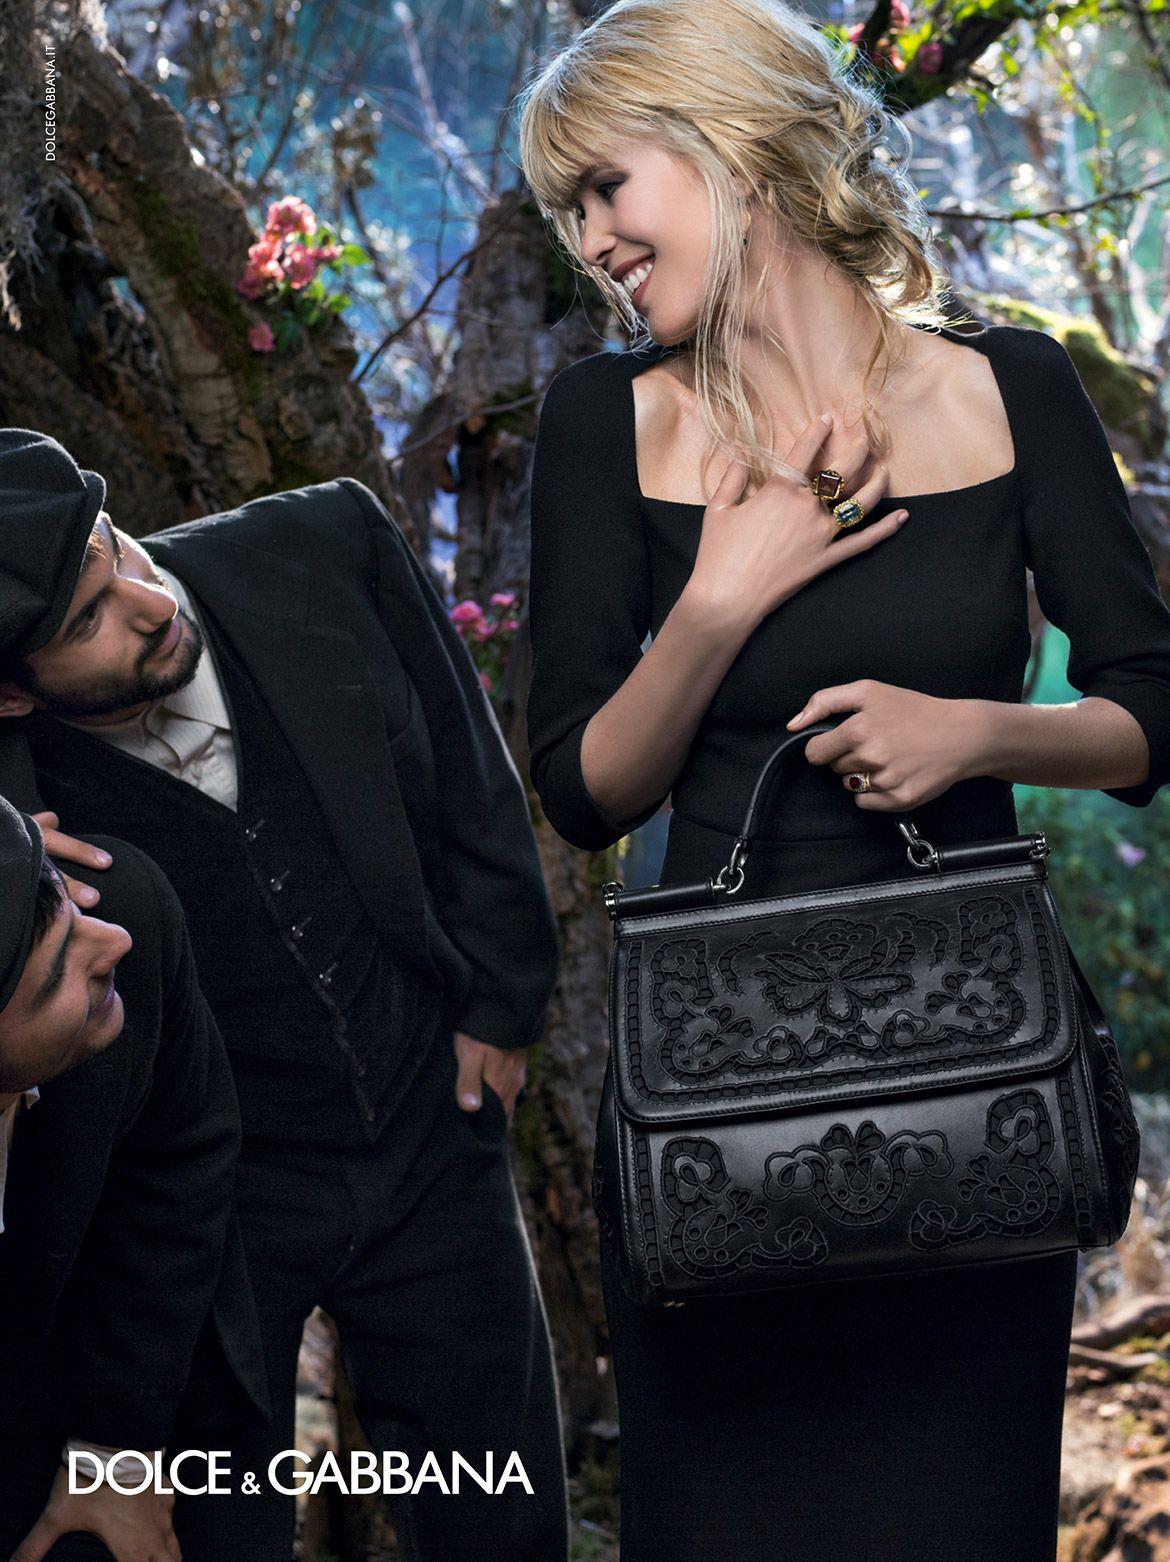 4ace2c4a75f9 Dolce   Gabbana Fall Winter 2014 Campaign